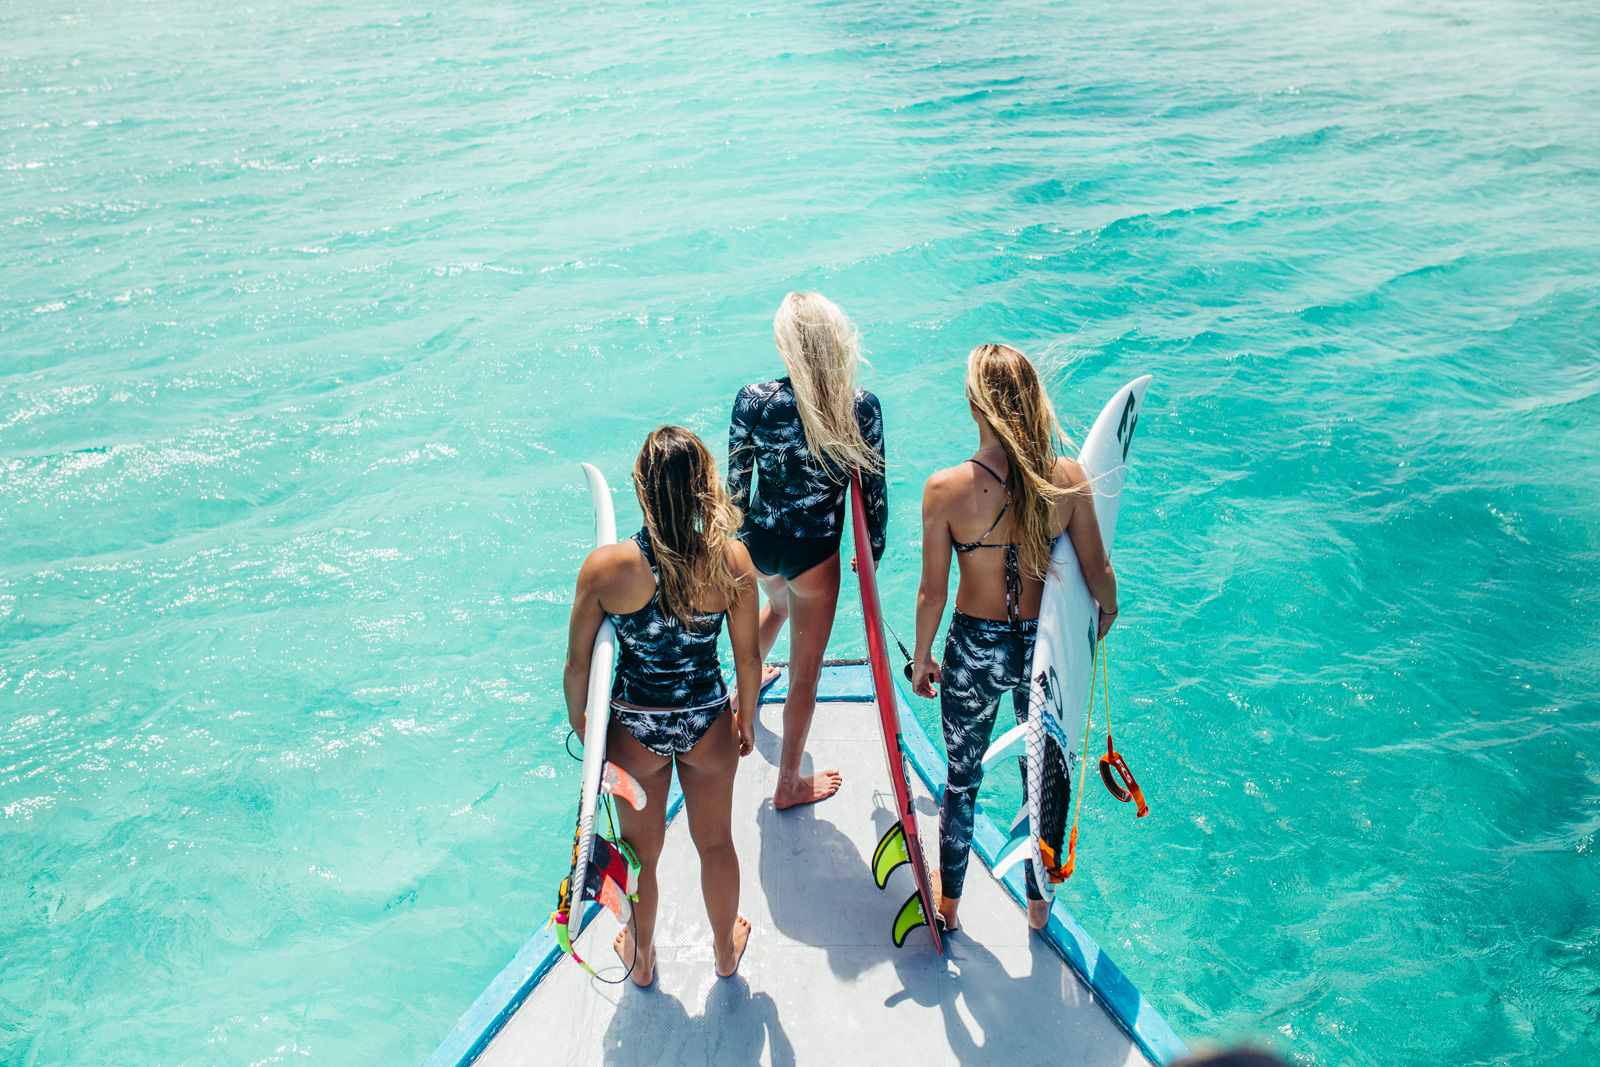 Billabong Surf Capsule Collection 2017 - KiteSista